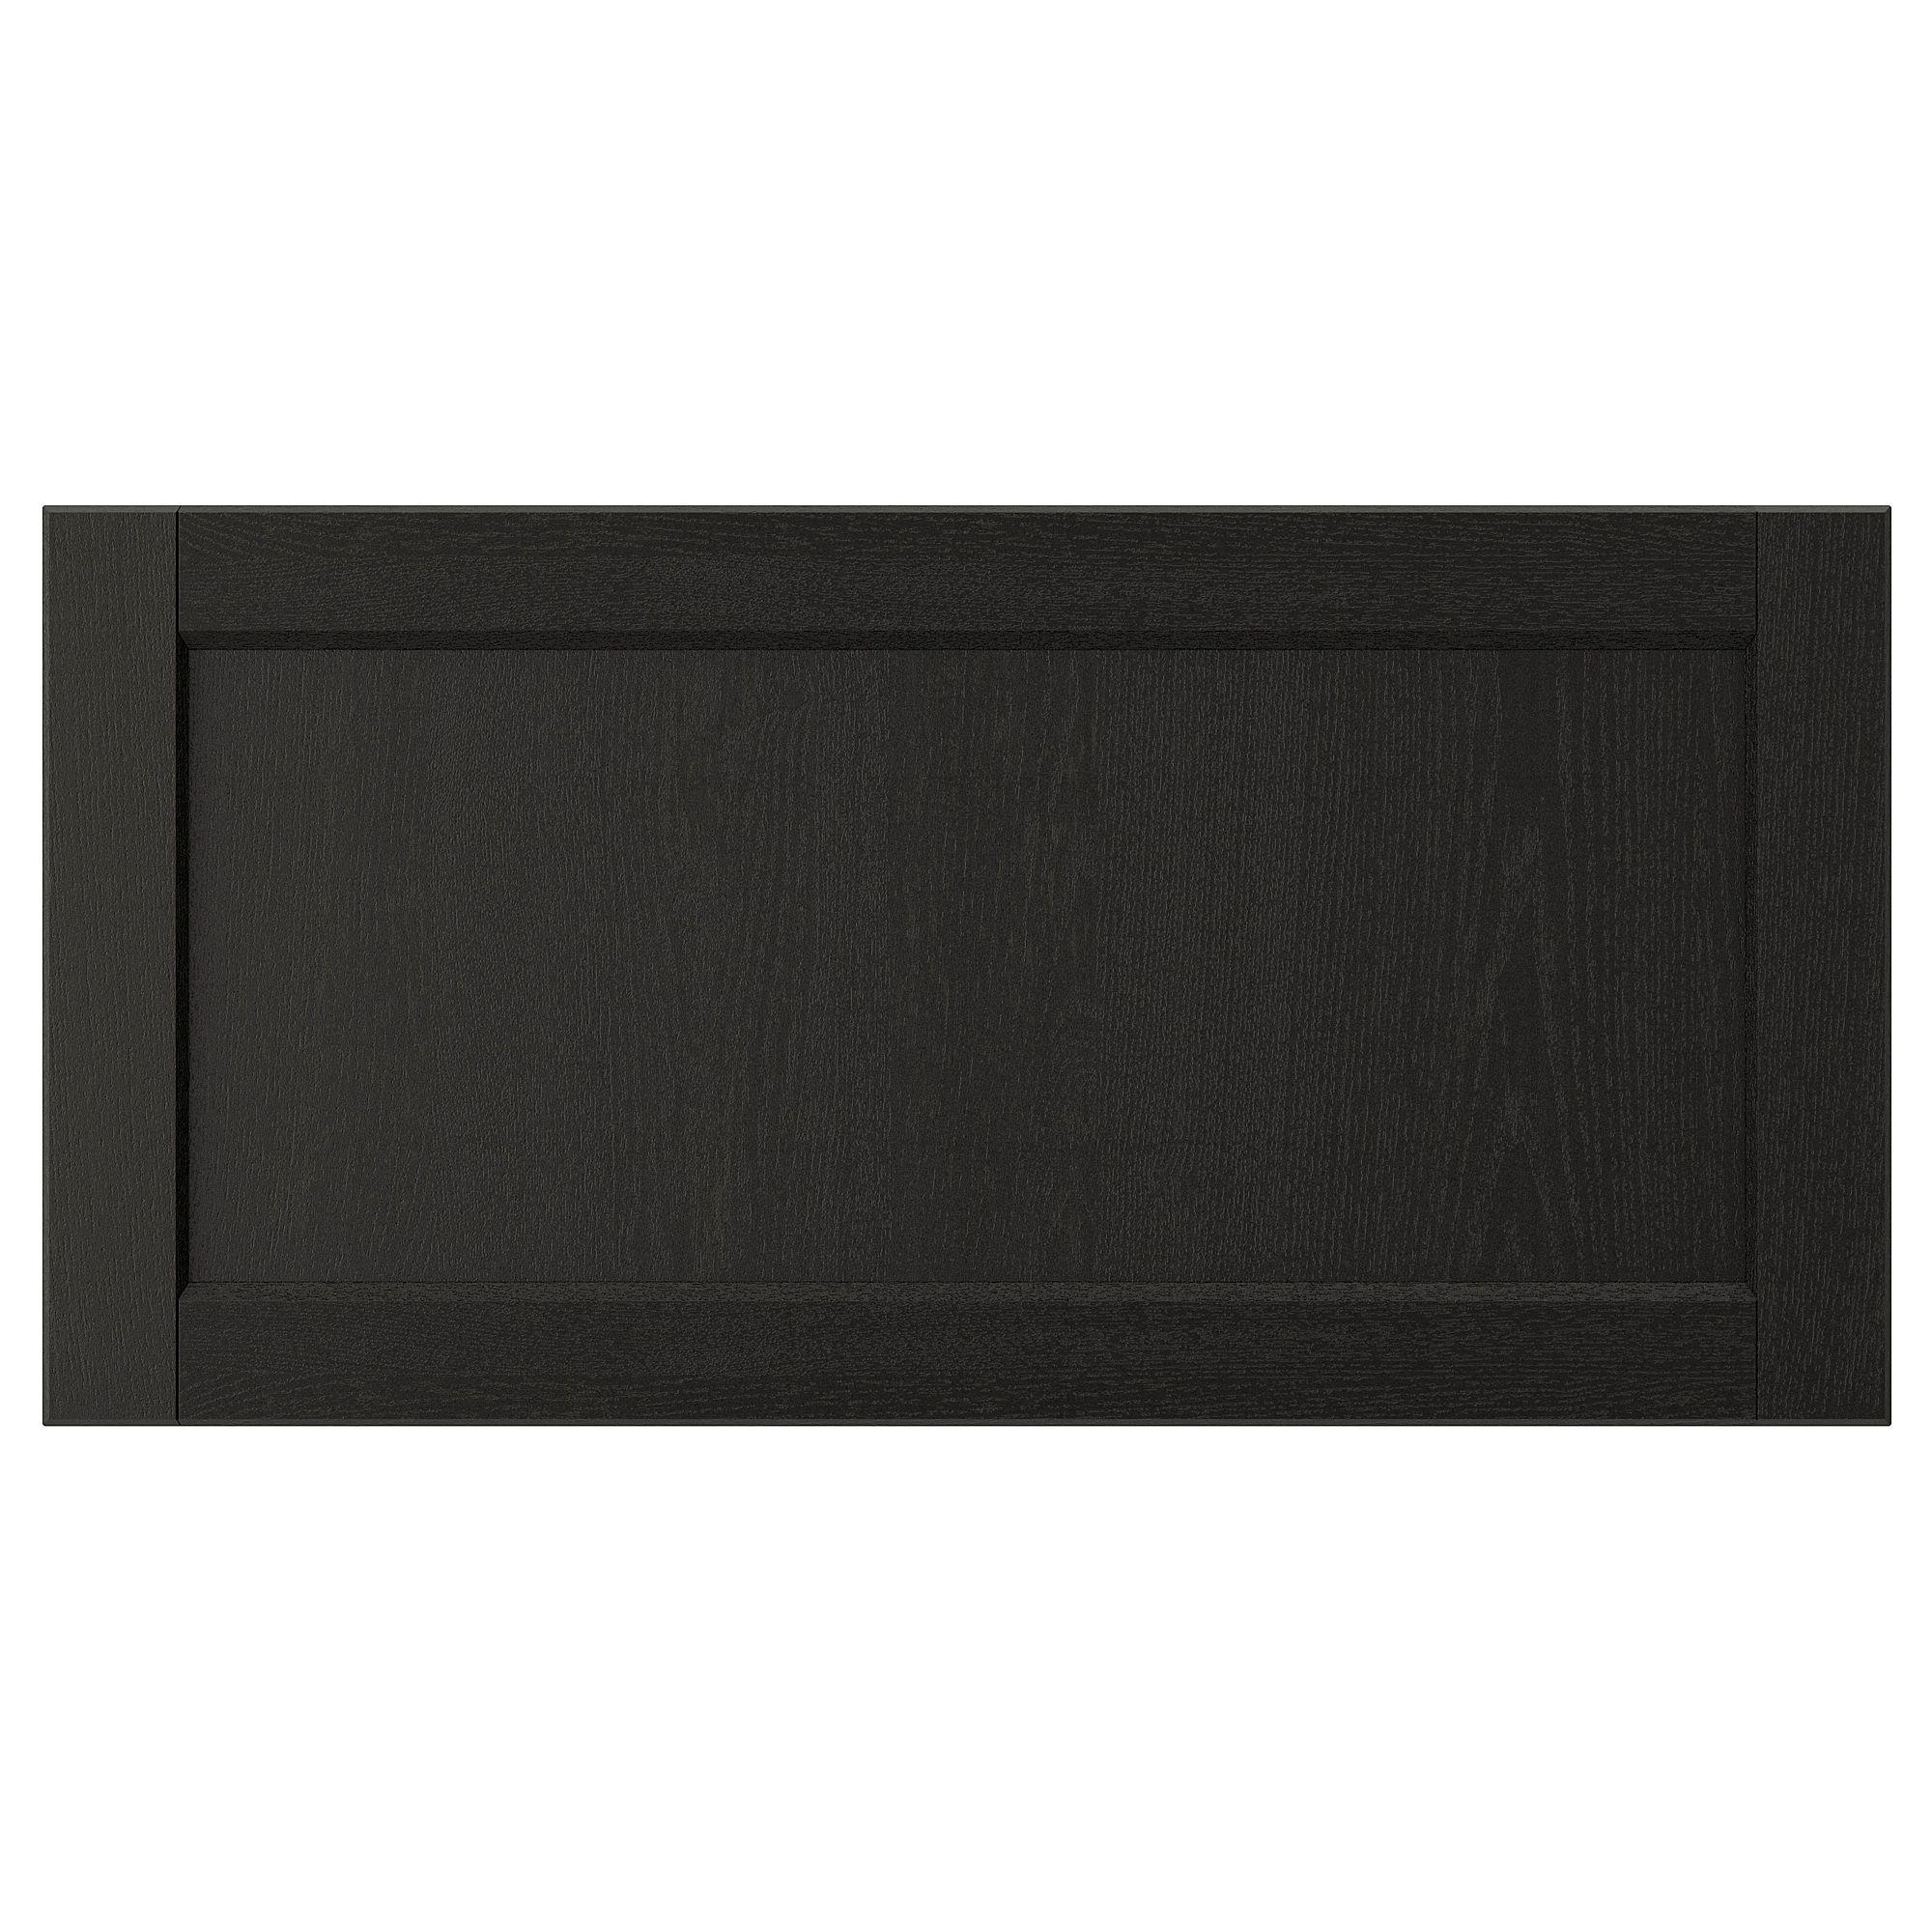 LERHYTTAN black stained, Drawer front